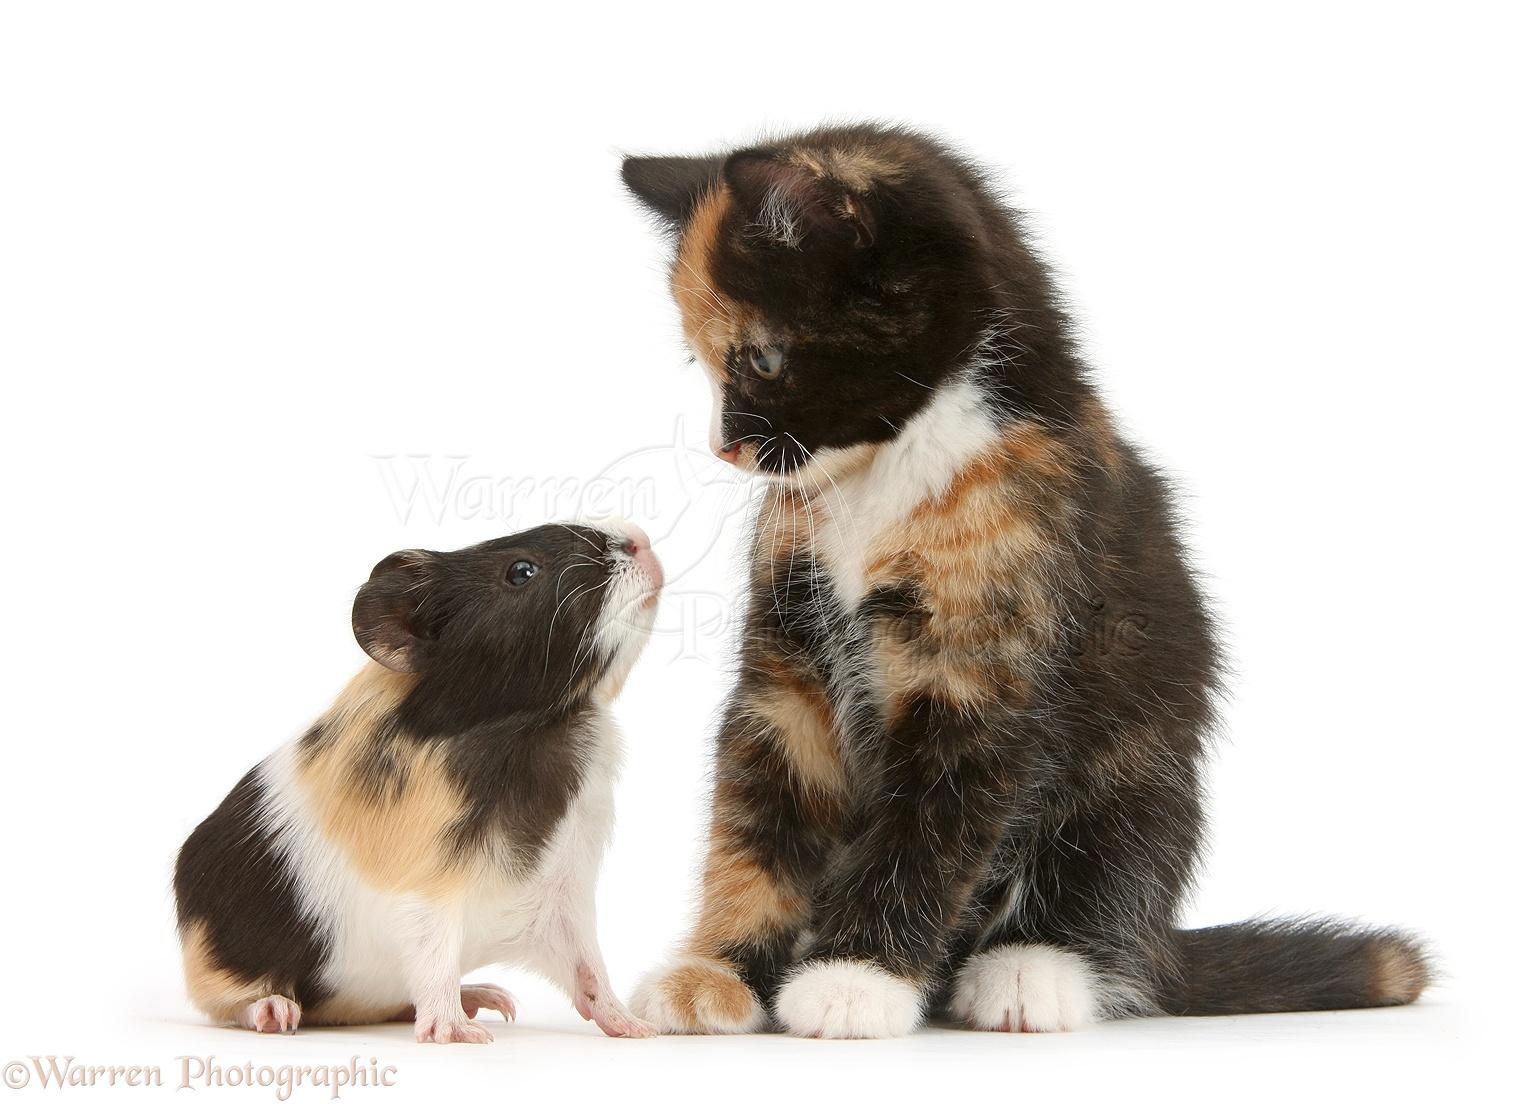 Wp31719 tortoiseshell kitten with baby tortoiseshell guinea pig